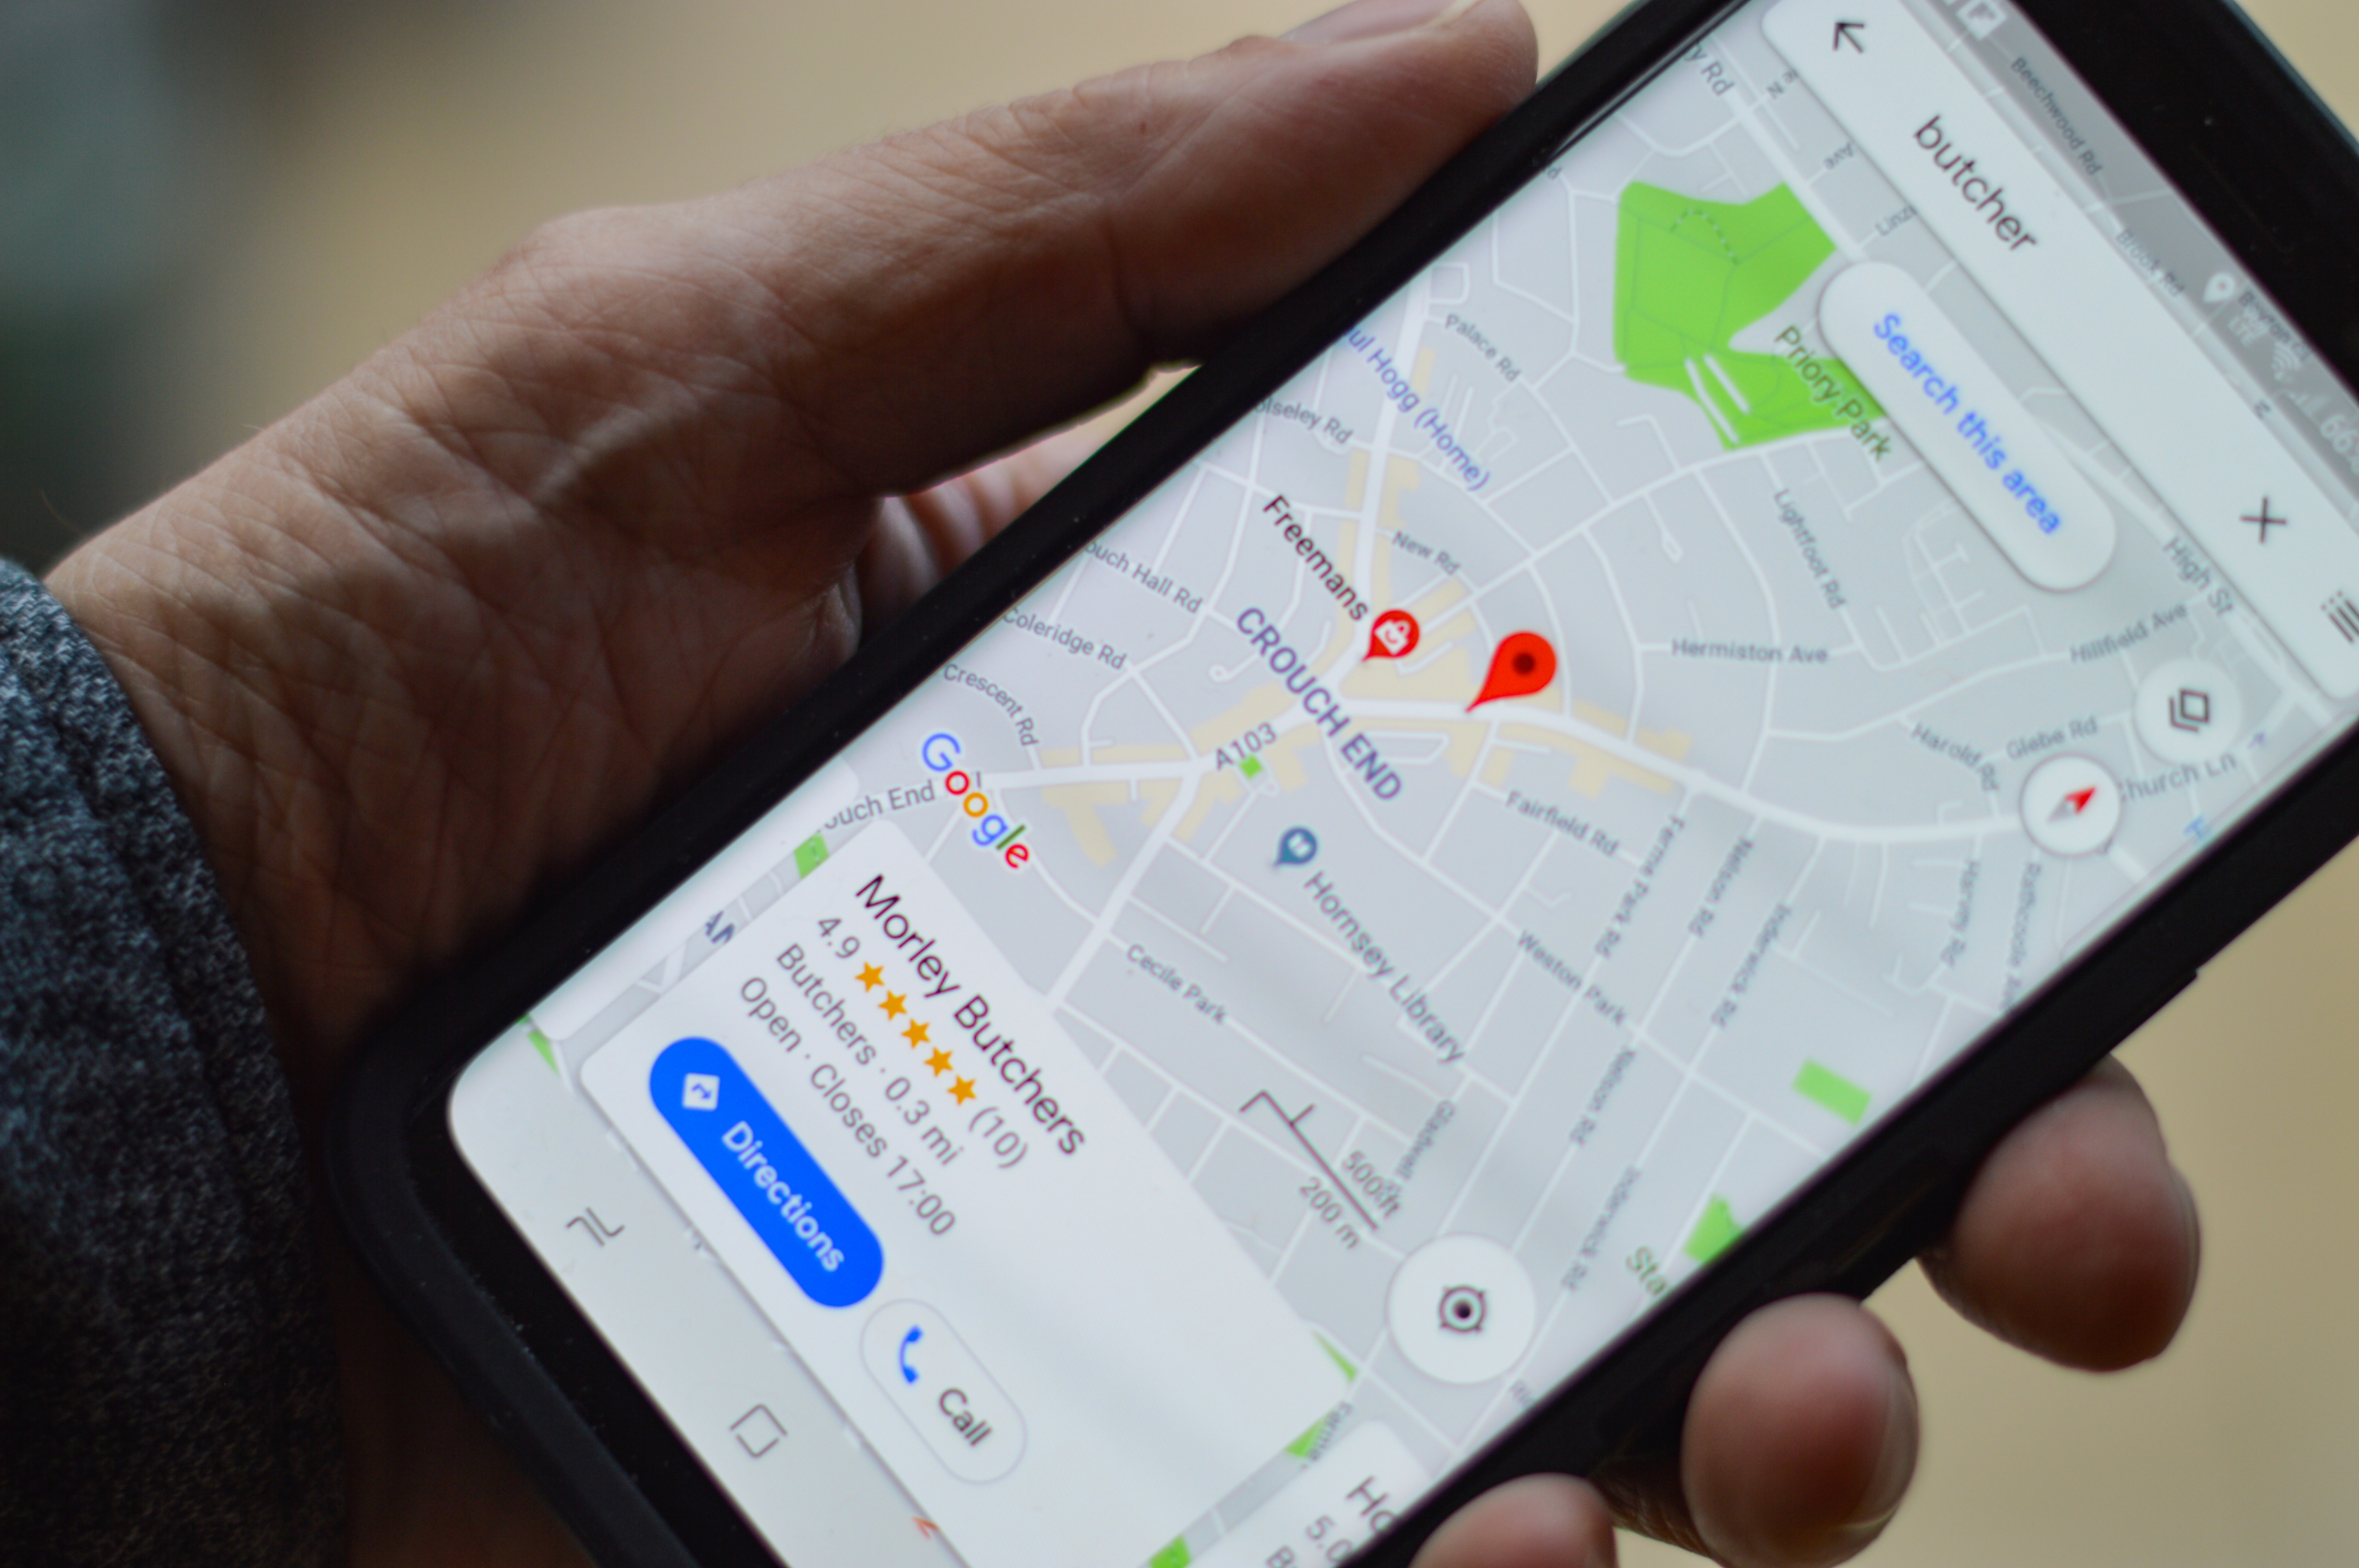 Google introduces ability to auto-delete location data